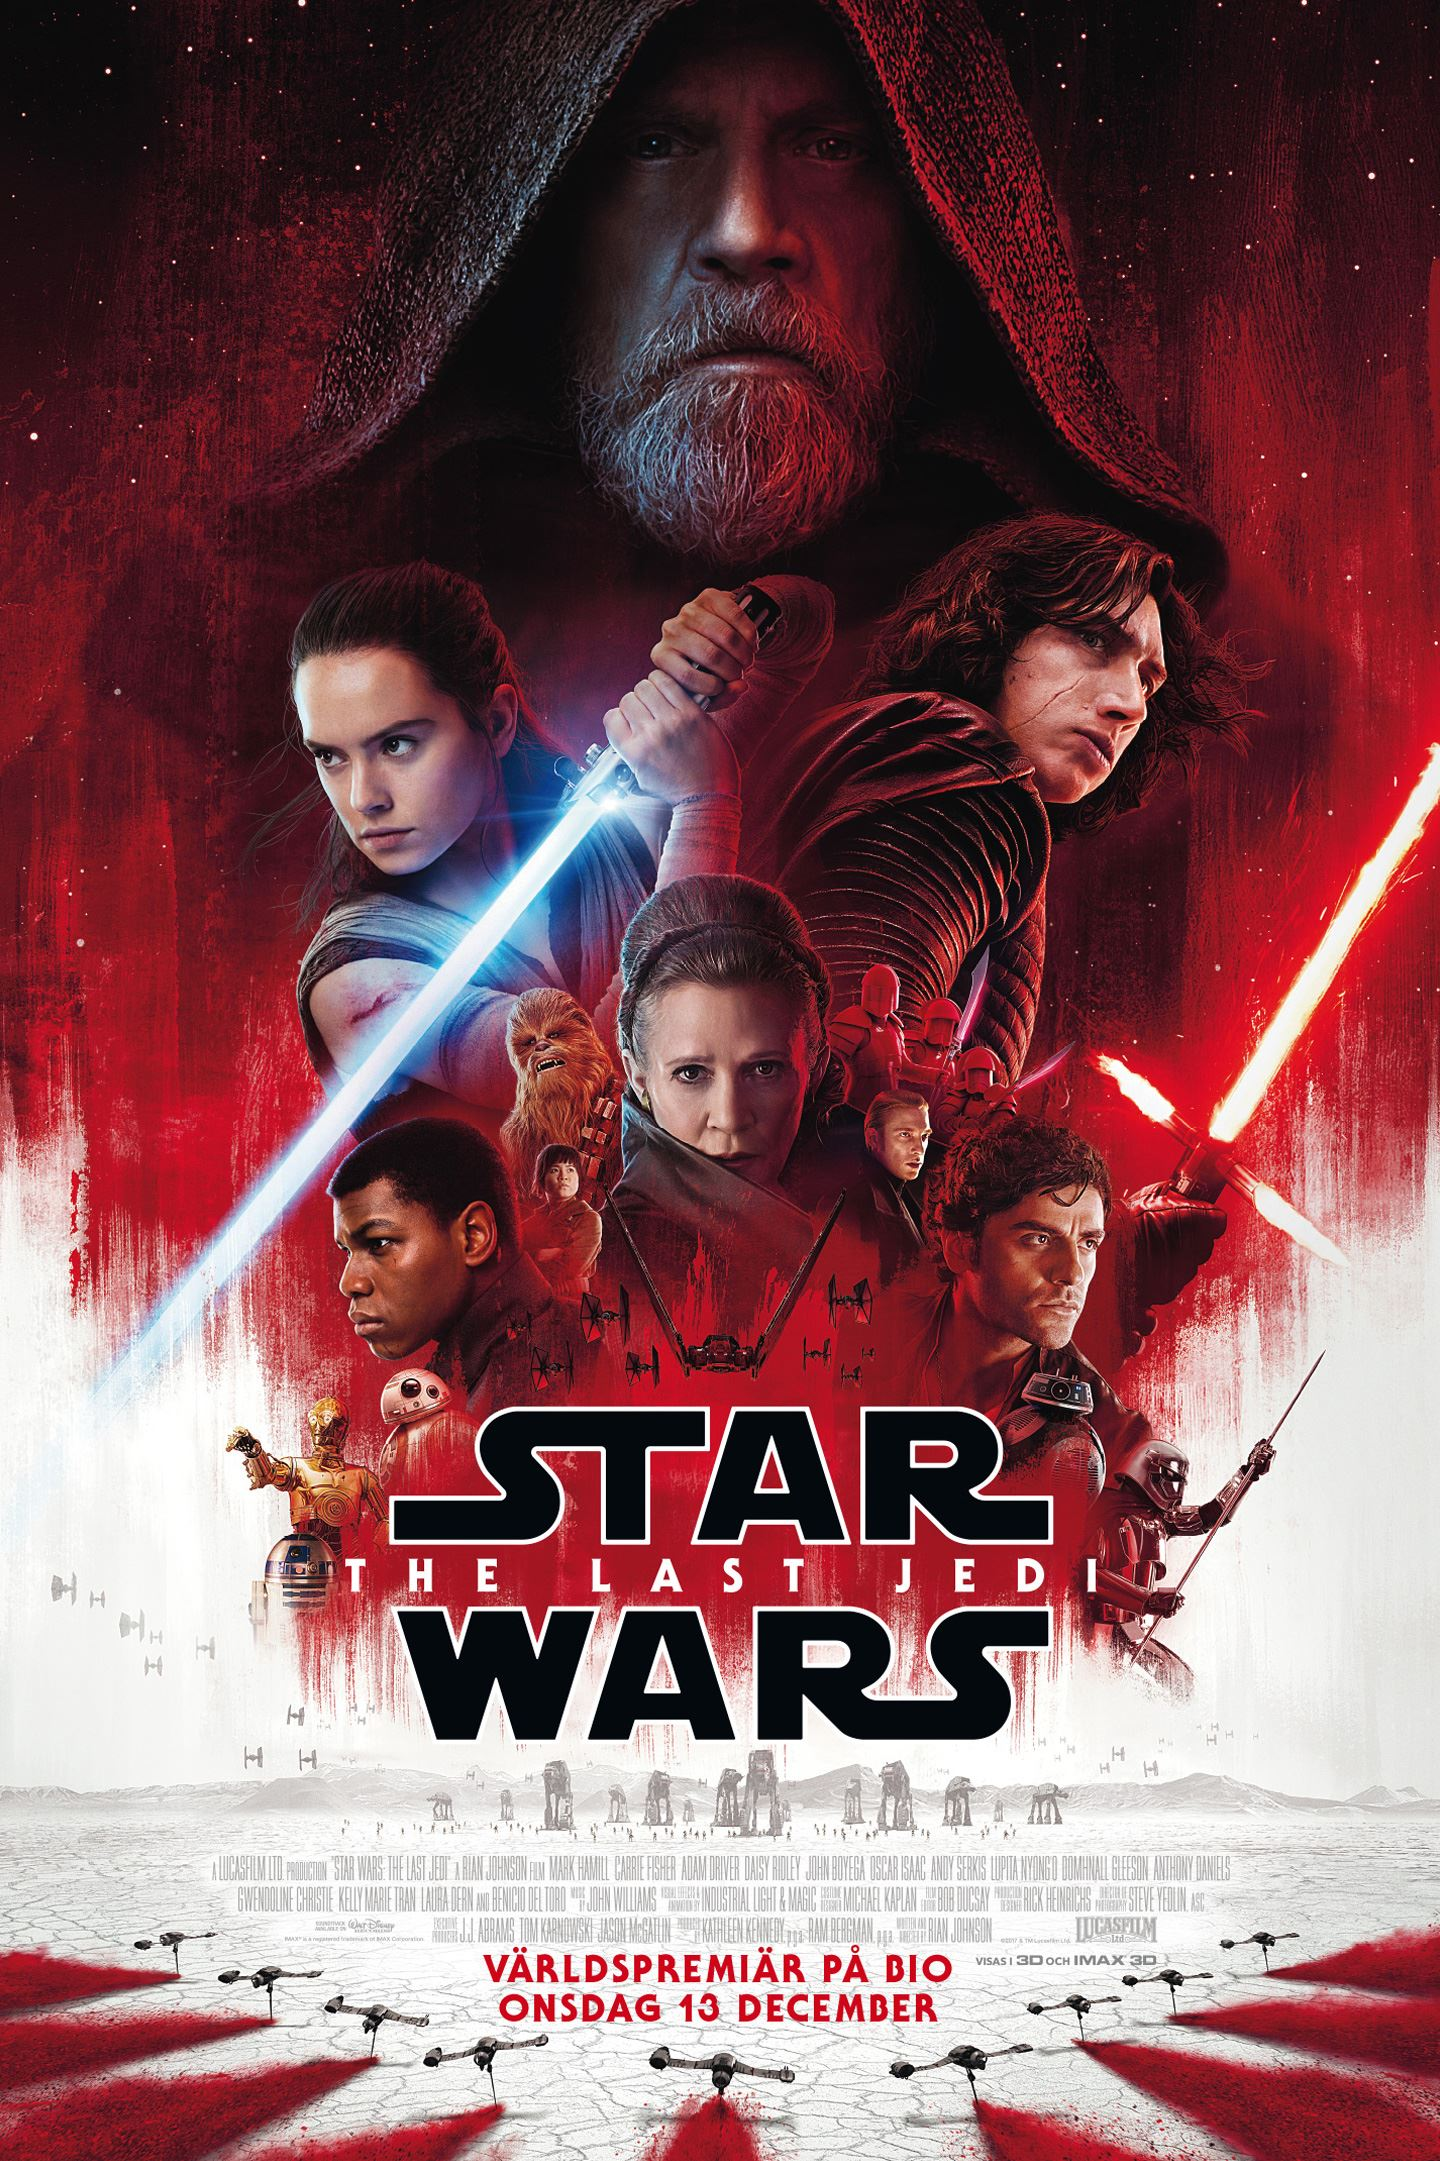 Bio: Star Wars: The Last Jedi